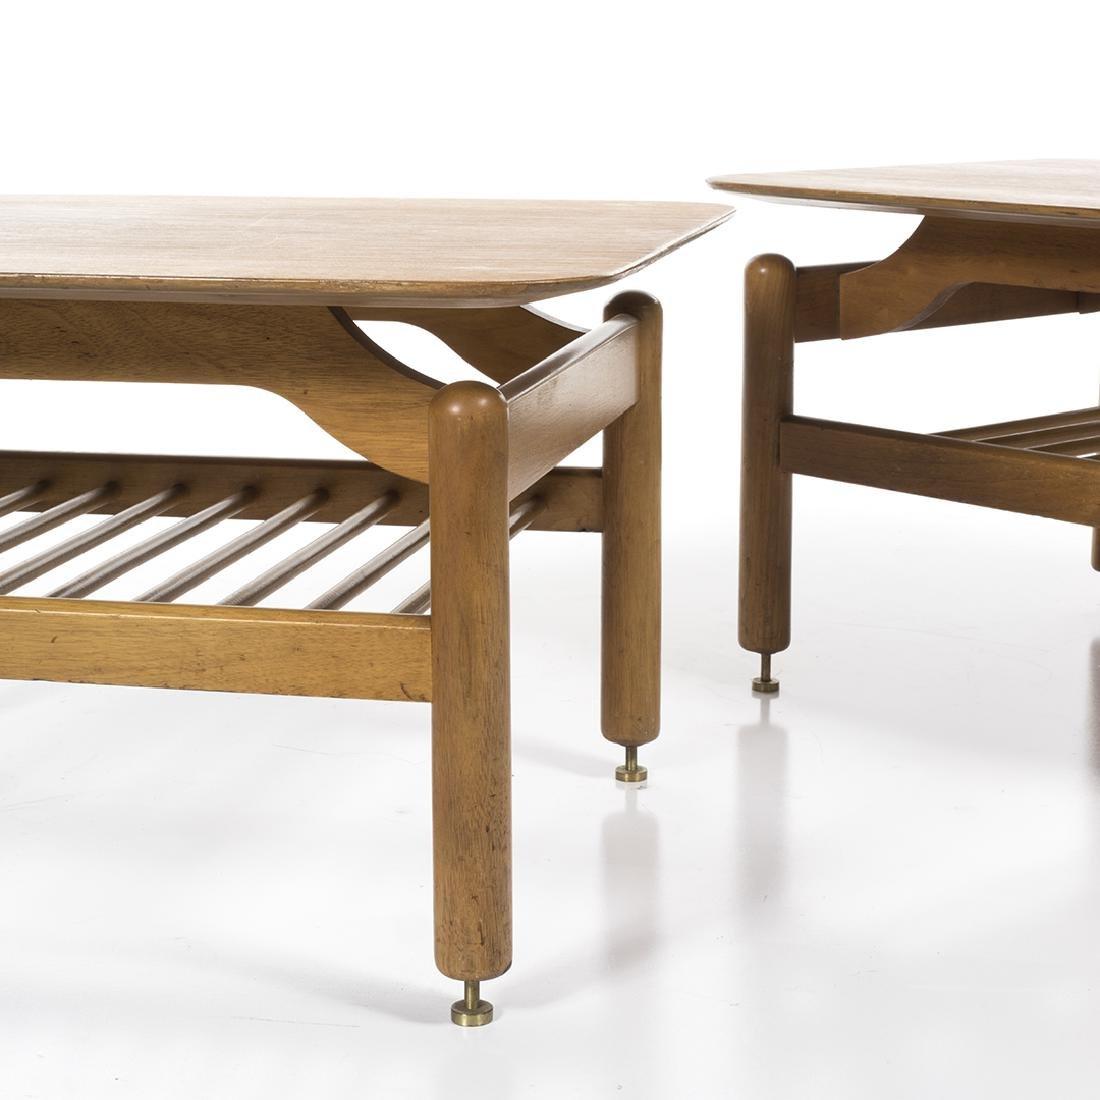 Greta Grossman Tables (2) - 4